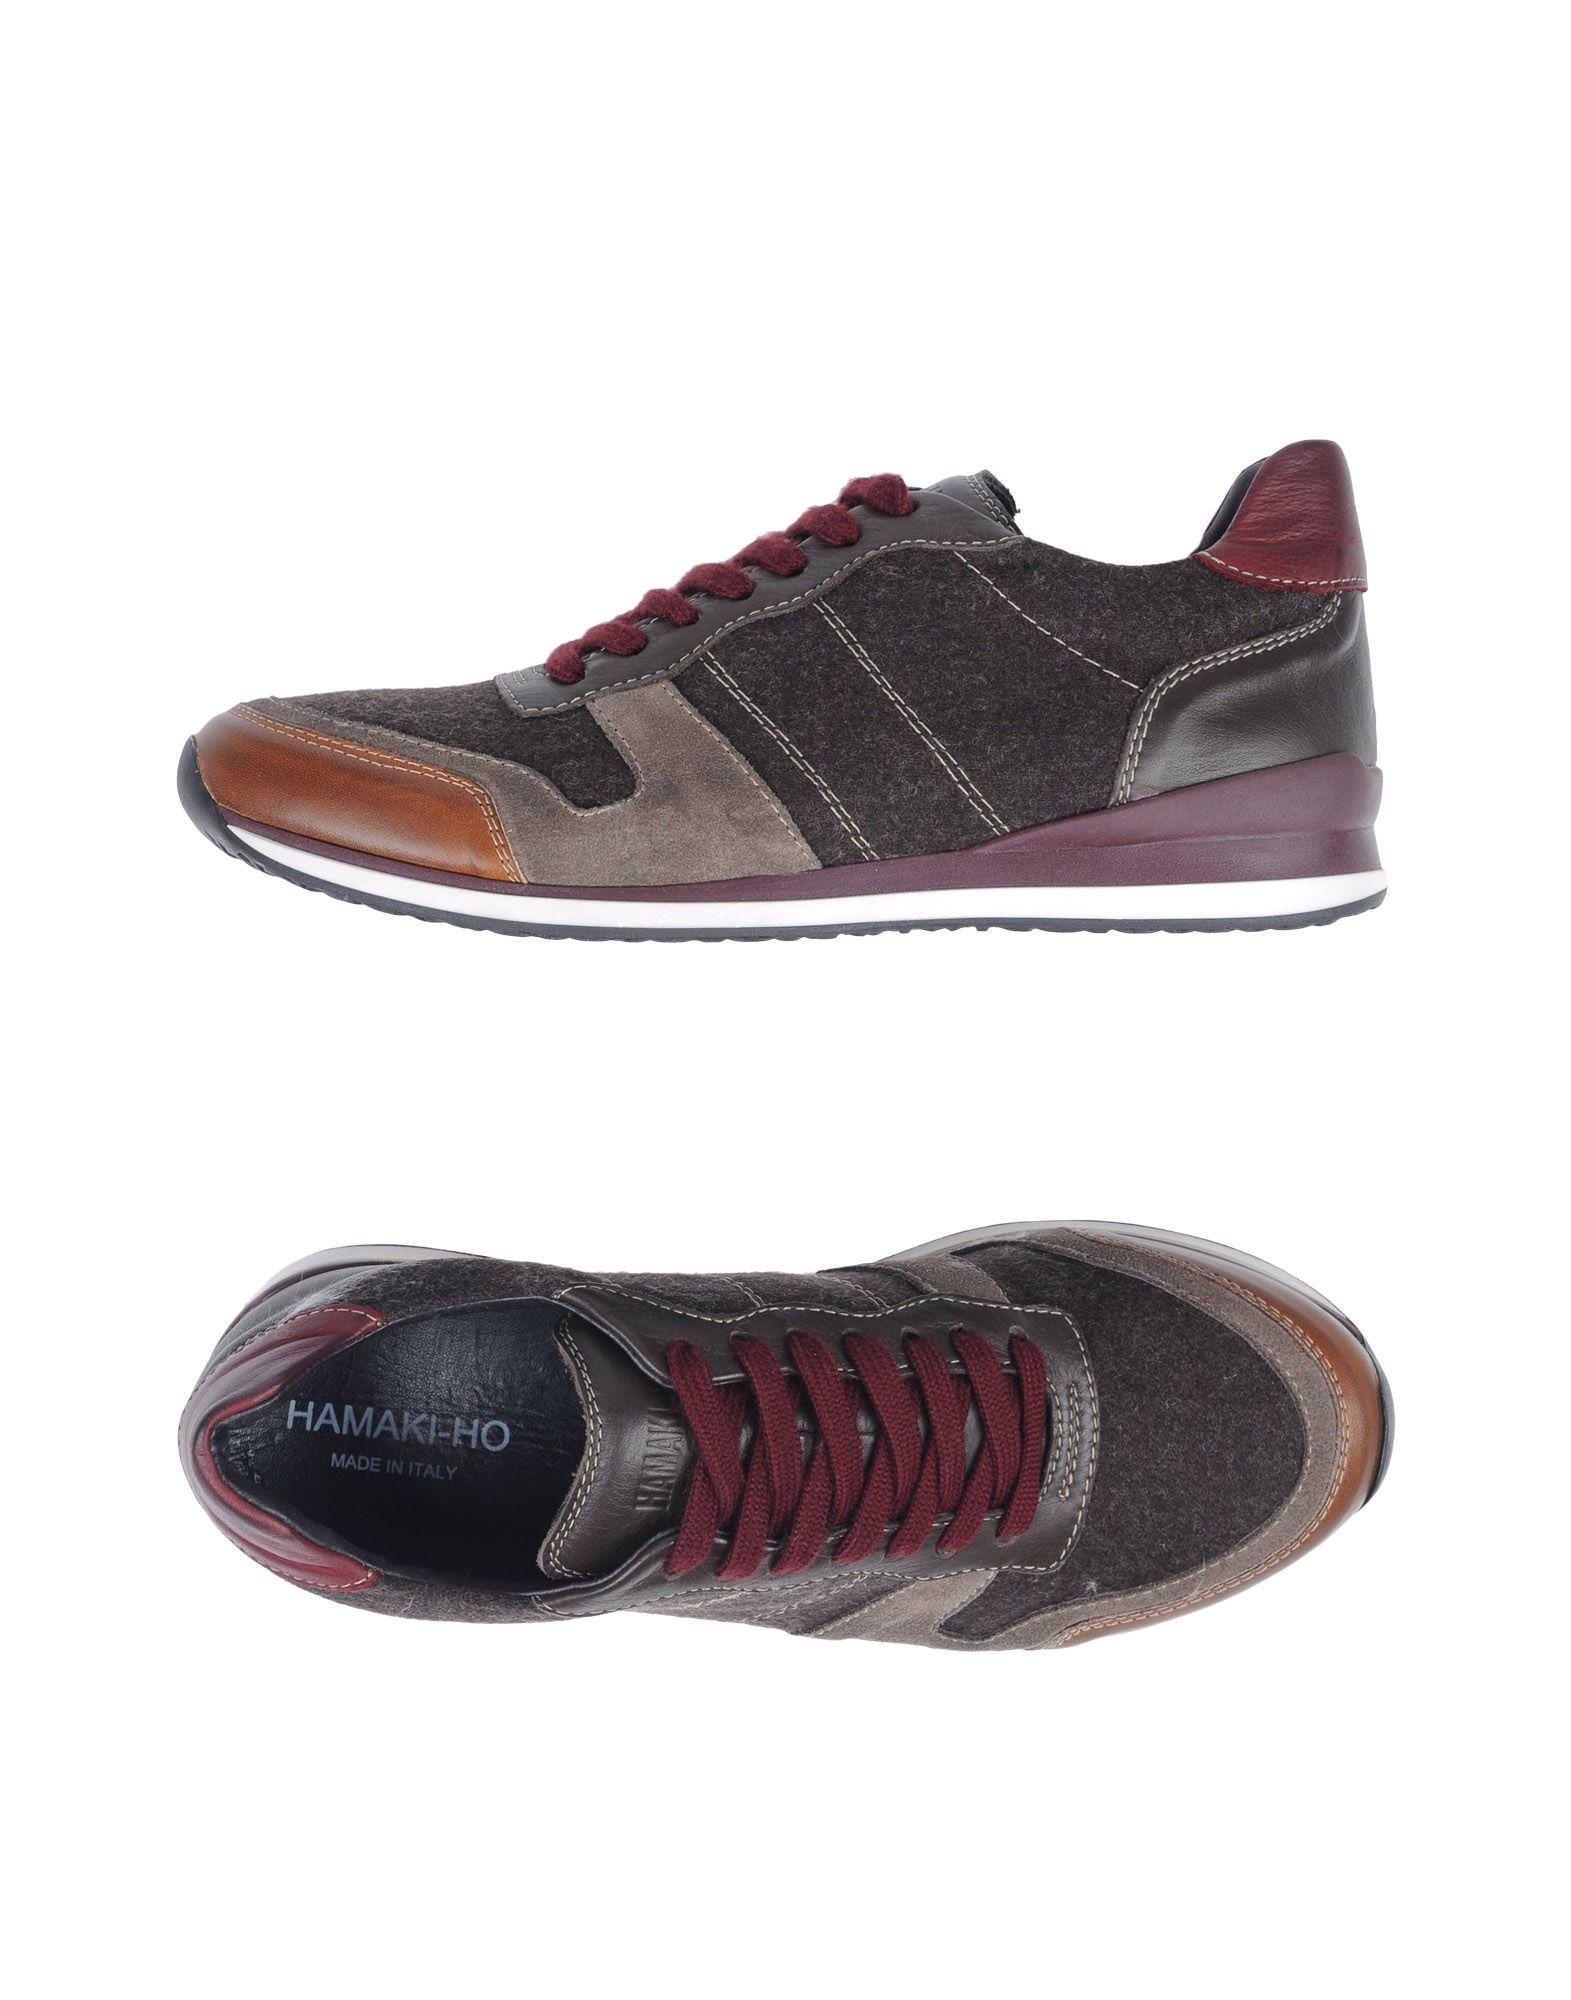 Sneakers Hamaki-Ho Homme - Sneakers Hamaki-Ho sur